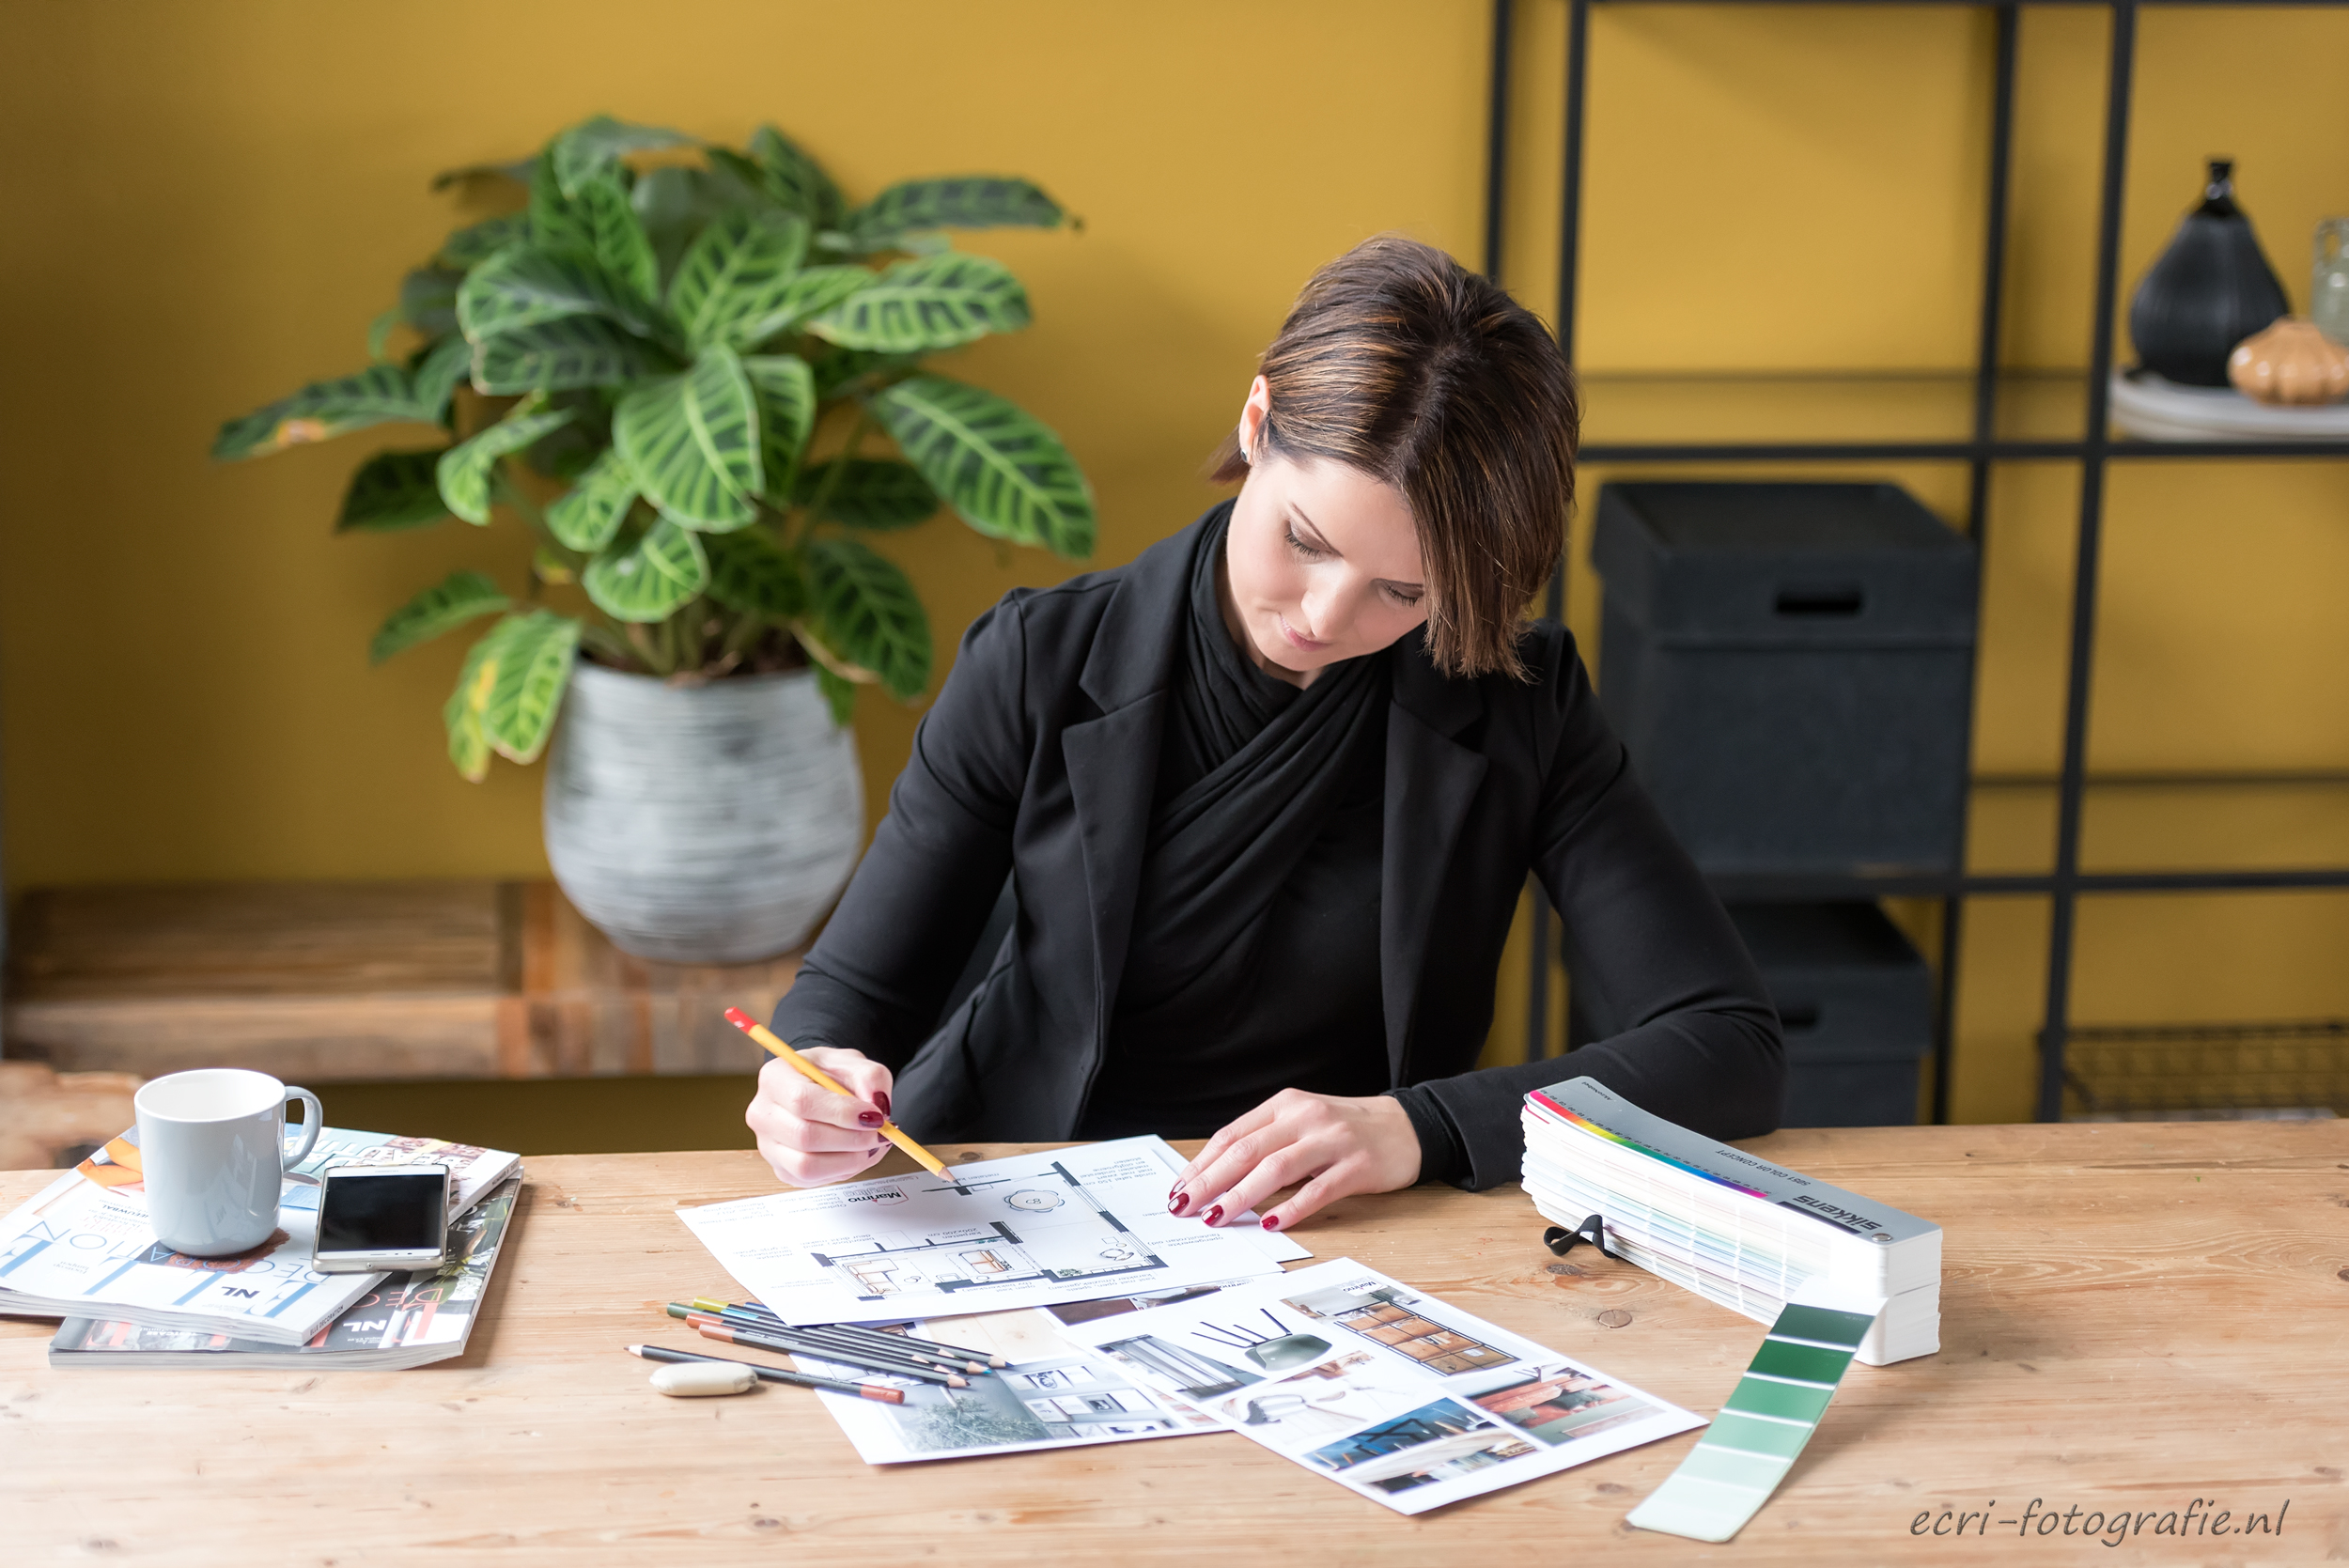 Marimo Styling Gieten, bedrijfsfotografie, Eric de Jonge, ecri, ecri-fotografie, ecri-fotografie.nl